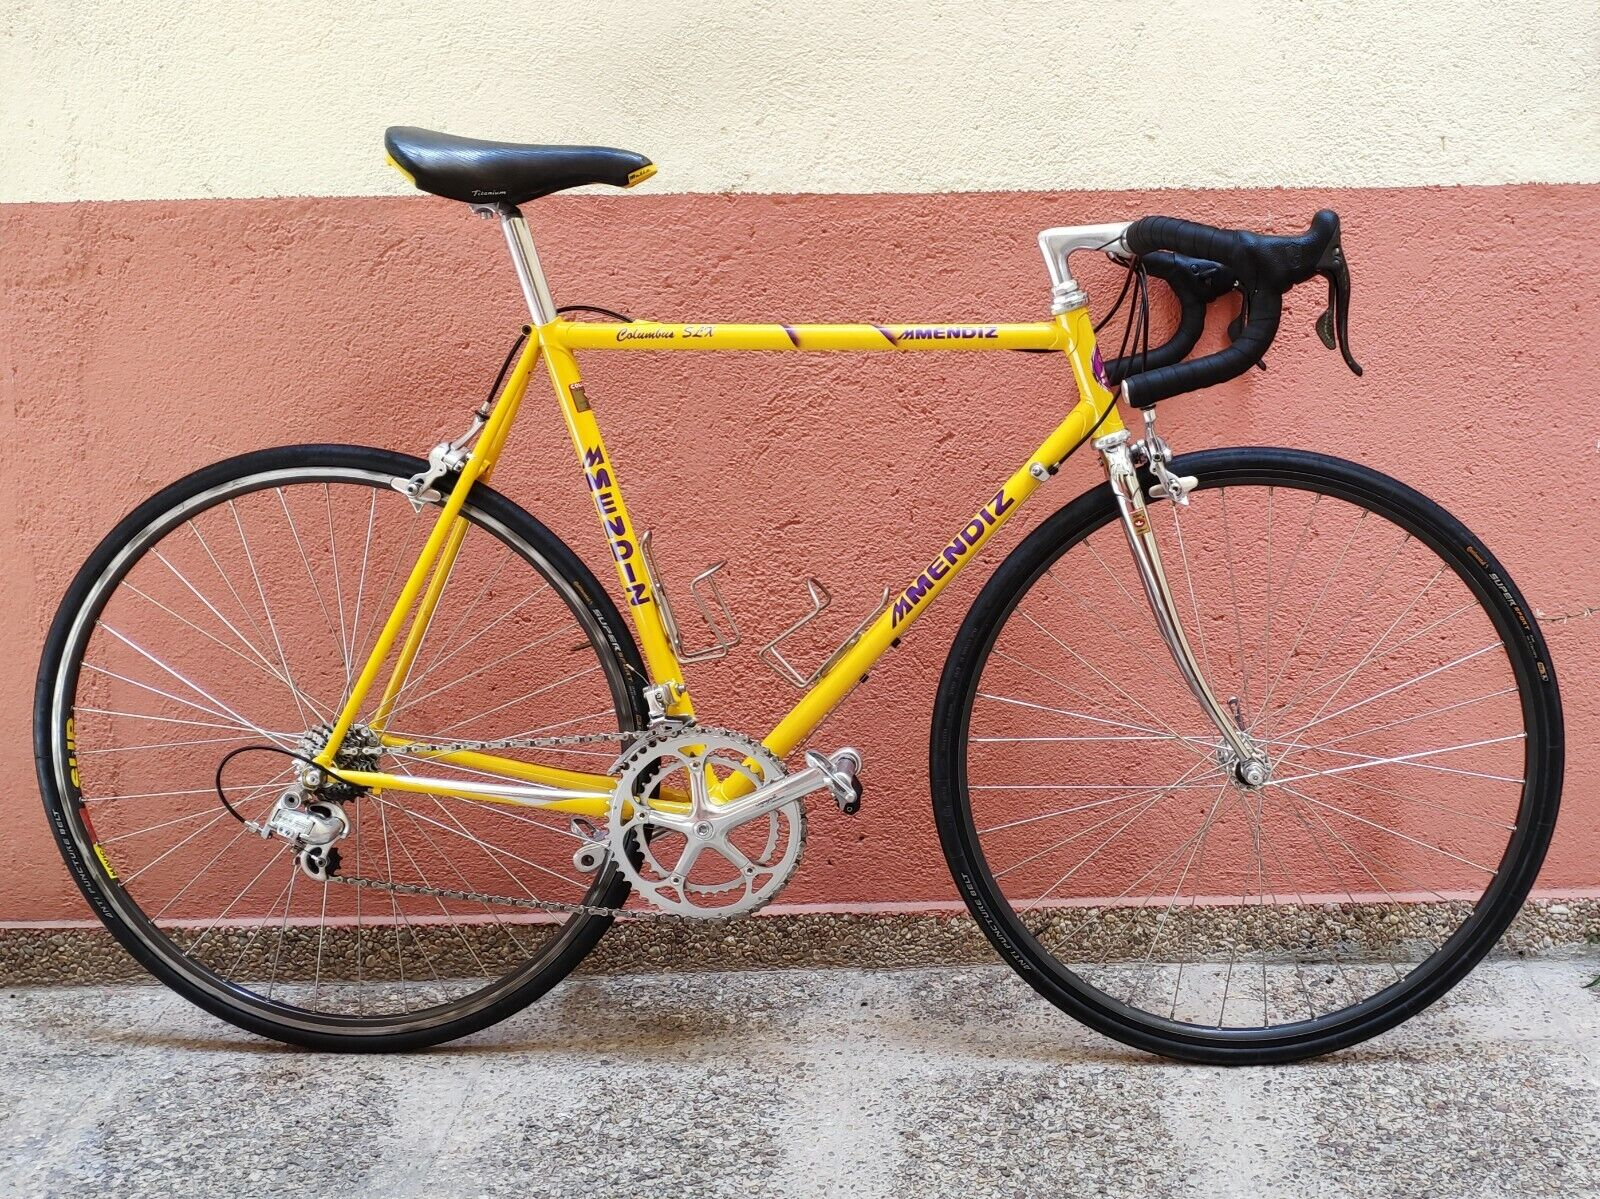 Nearly-New Mendiz SLX road bike with Titanium Campagnolo Record 9sp groupset